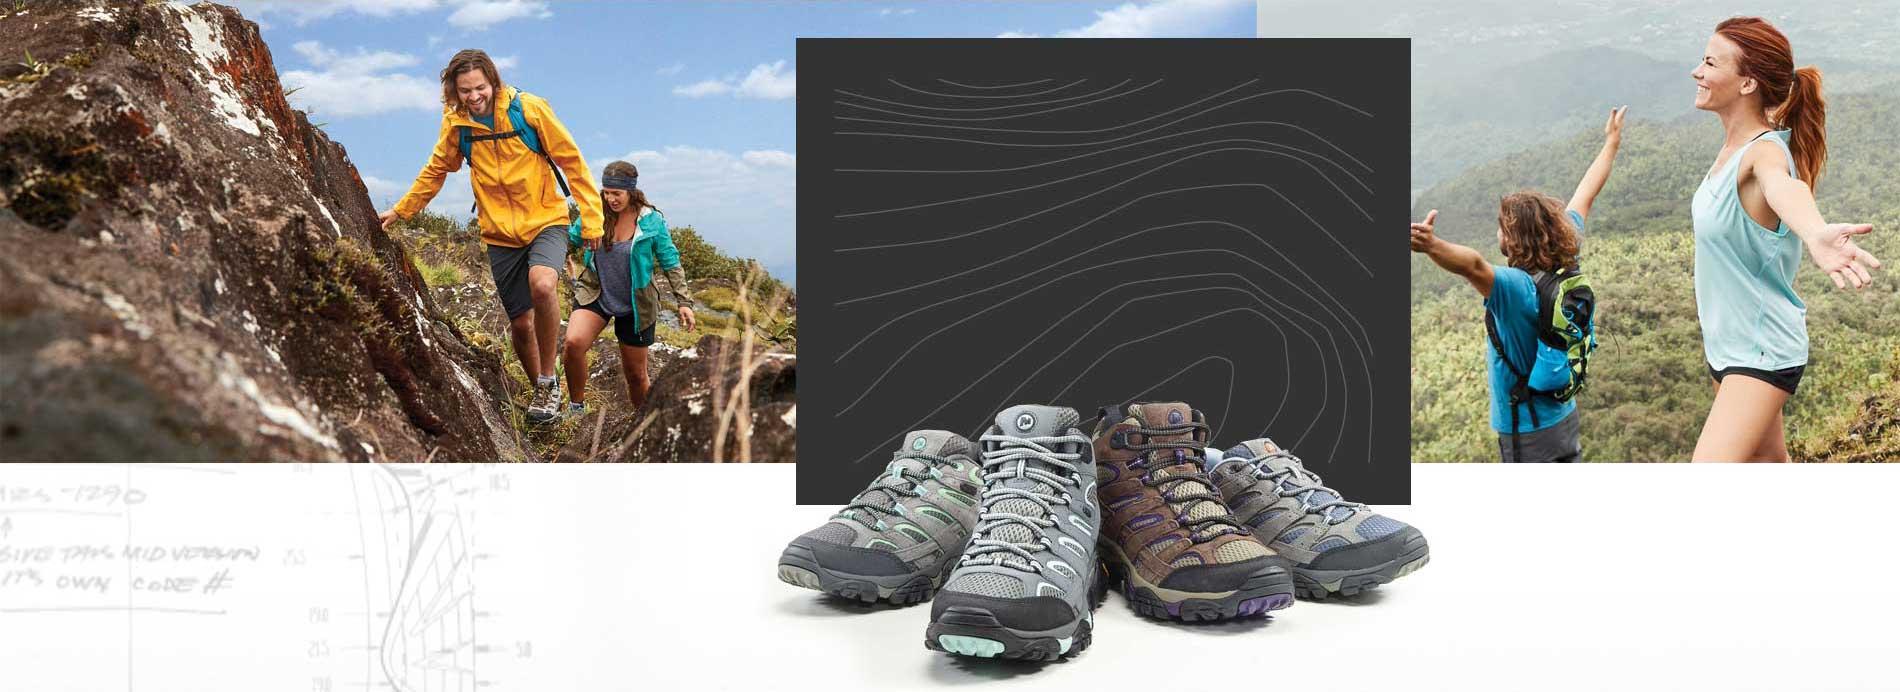 42f88100978 Merrell Moab 2 Hiking Boots & Shoes | Merrell